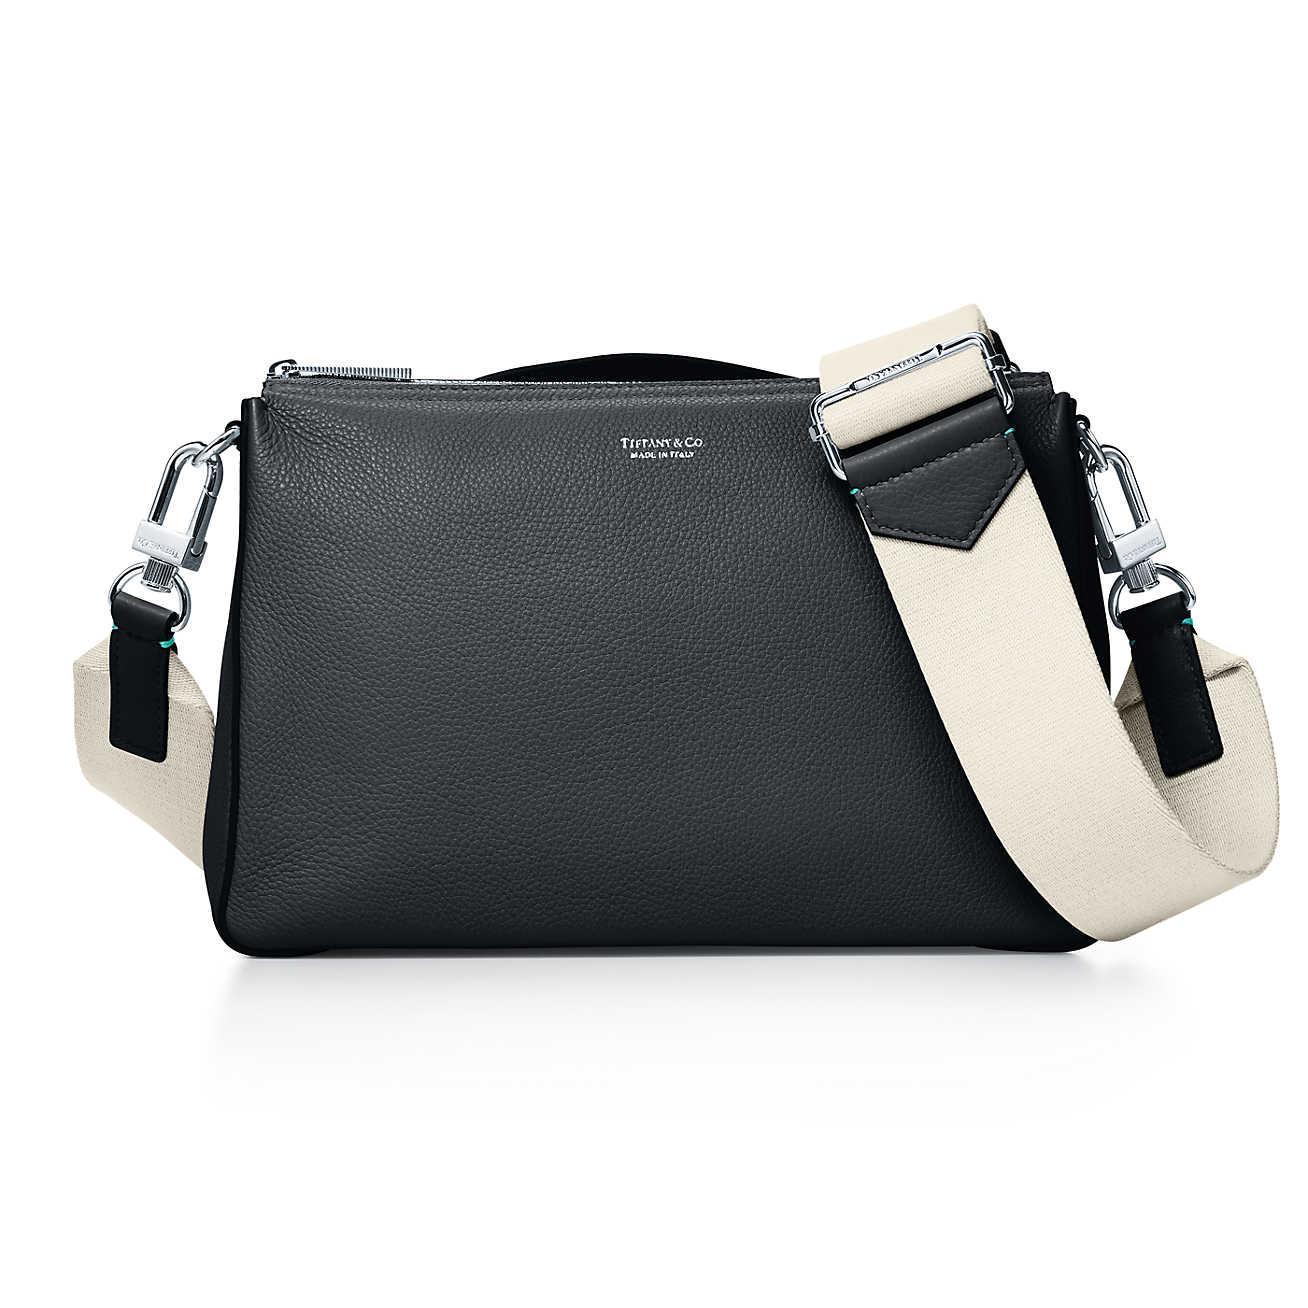 e3d11a0291 Tiffany   Co. Crossbody Bag In Black Grain Calfskin Leather in Black ...